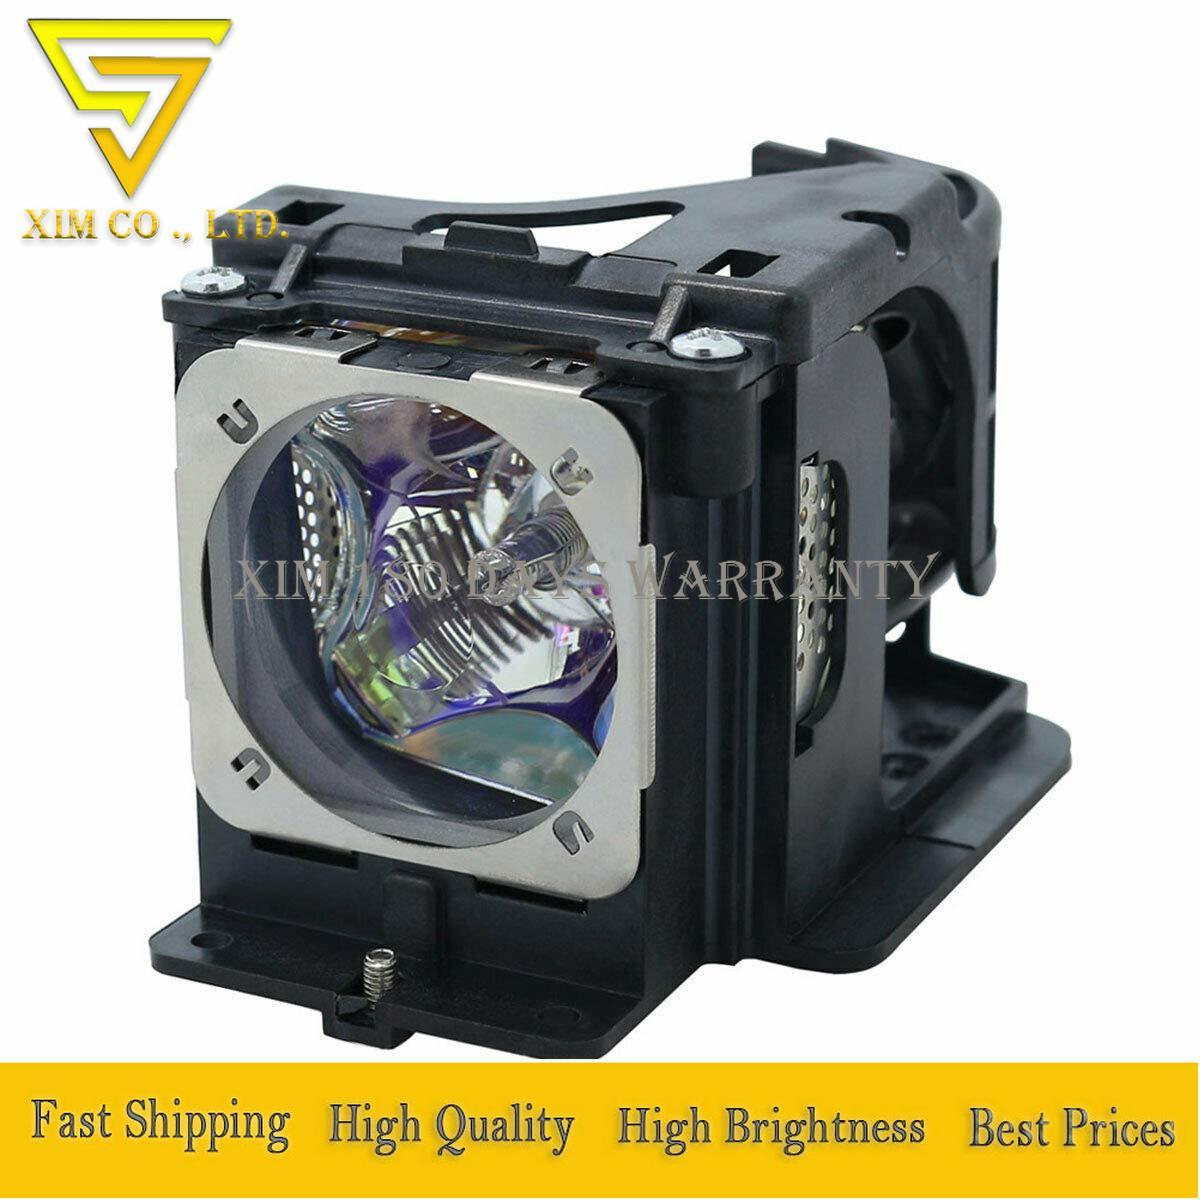 POA-LMP90/POA-LMP106 Replacement Projector Lamp for Sanyo PLC-SU70 PLC-XE40 PLC-XU2530C PLC-XU73 PLC-XU74 XU76 XU83 XU84 XU86